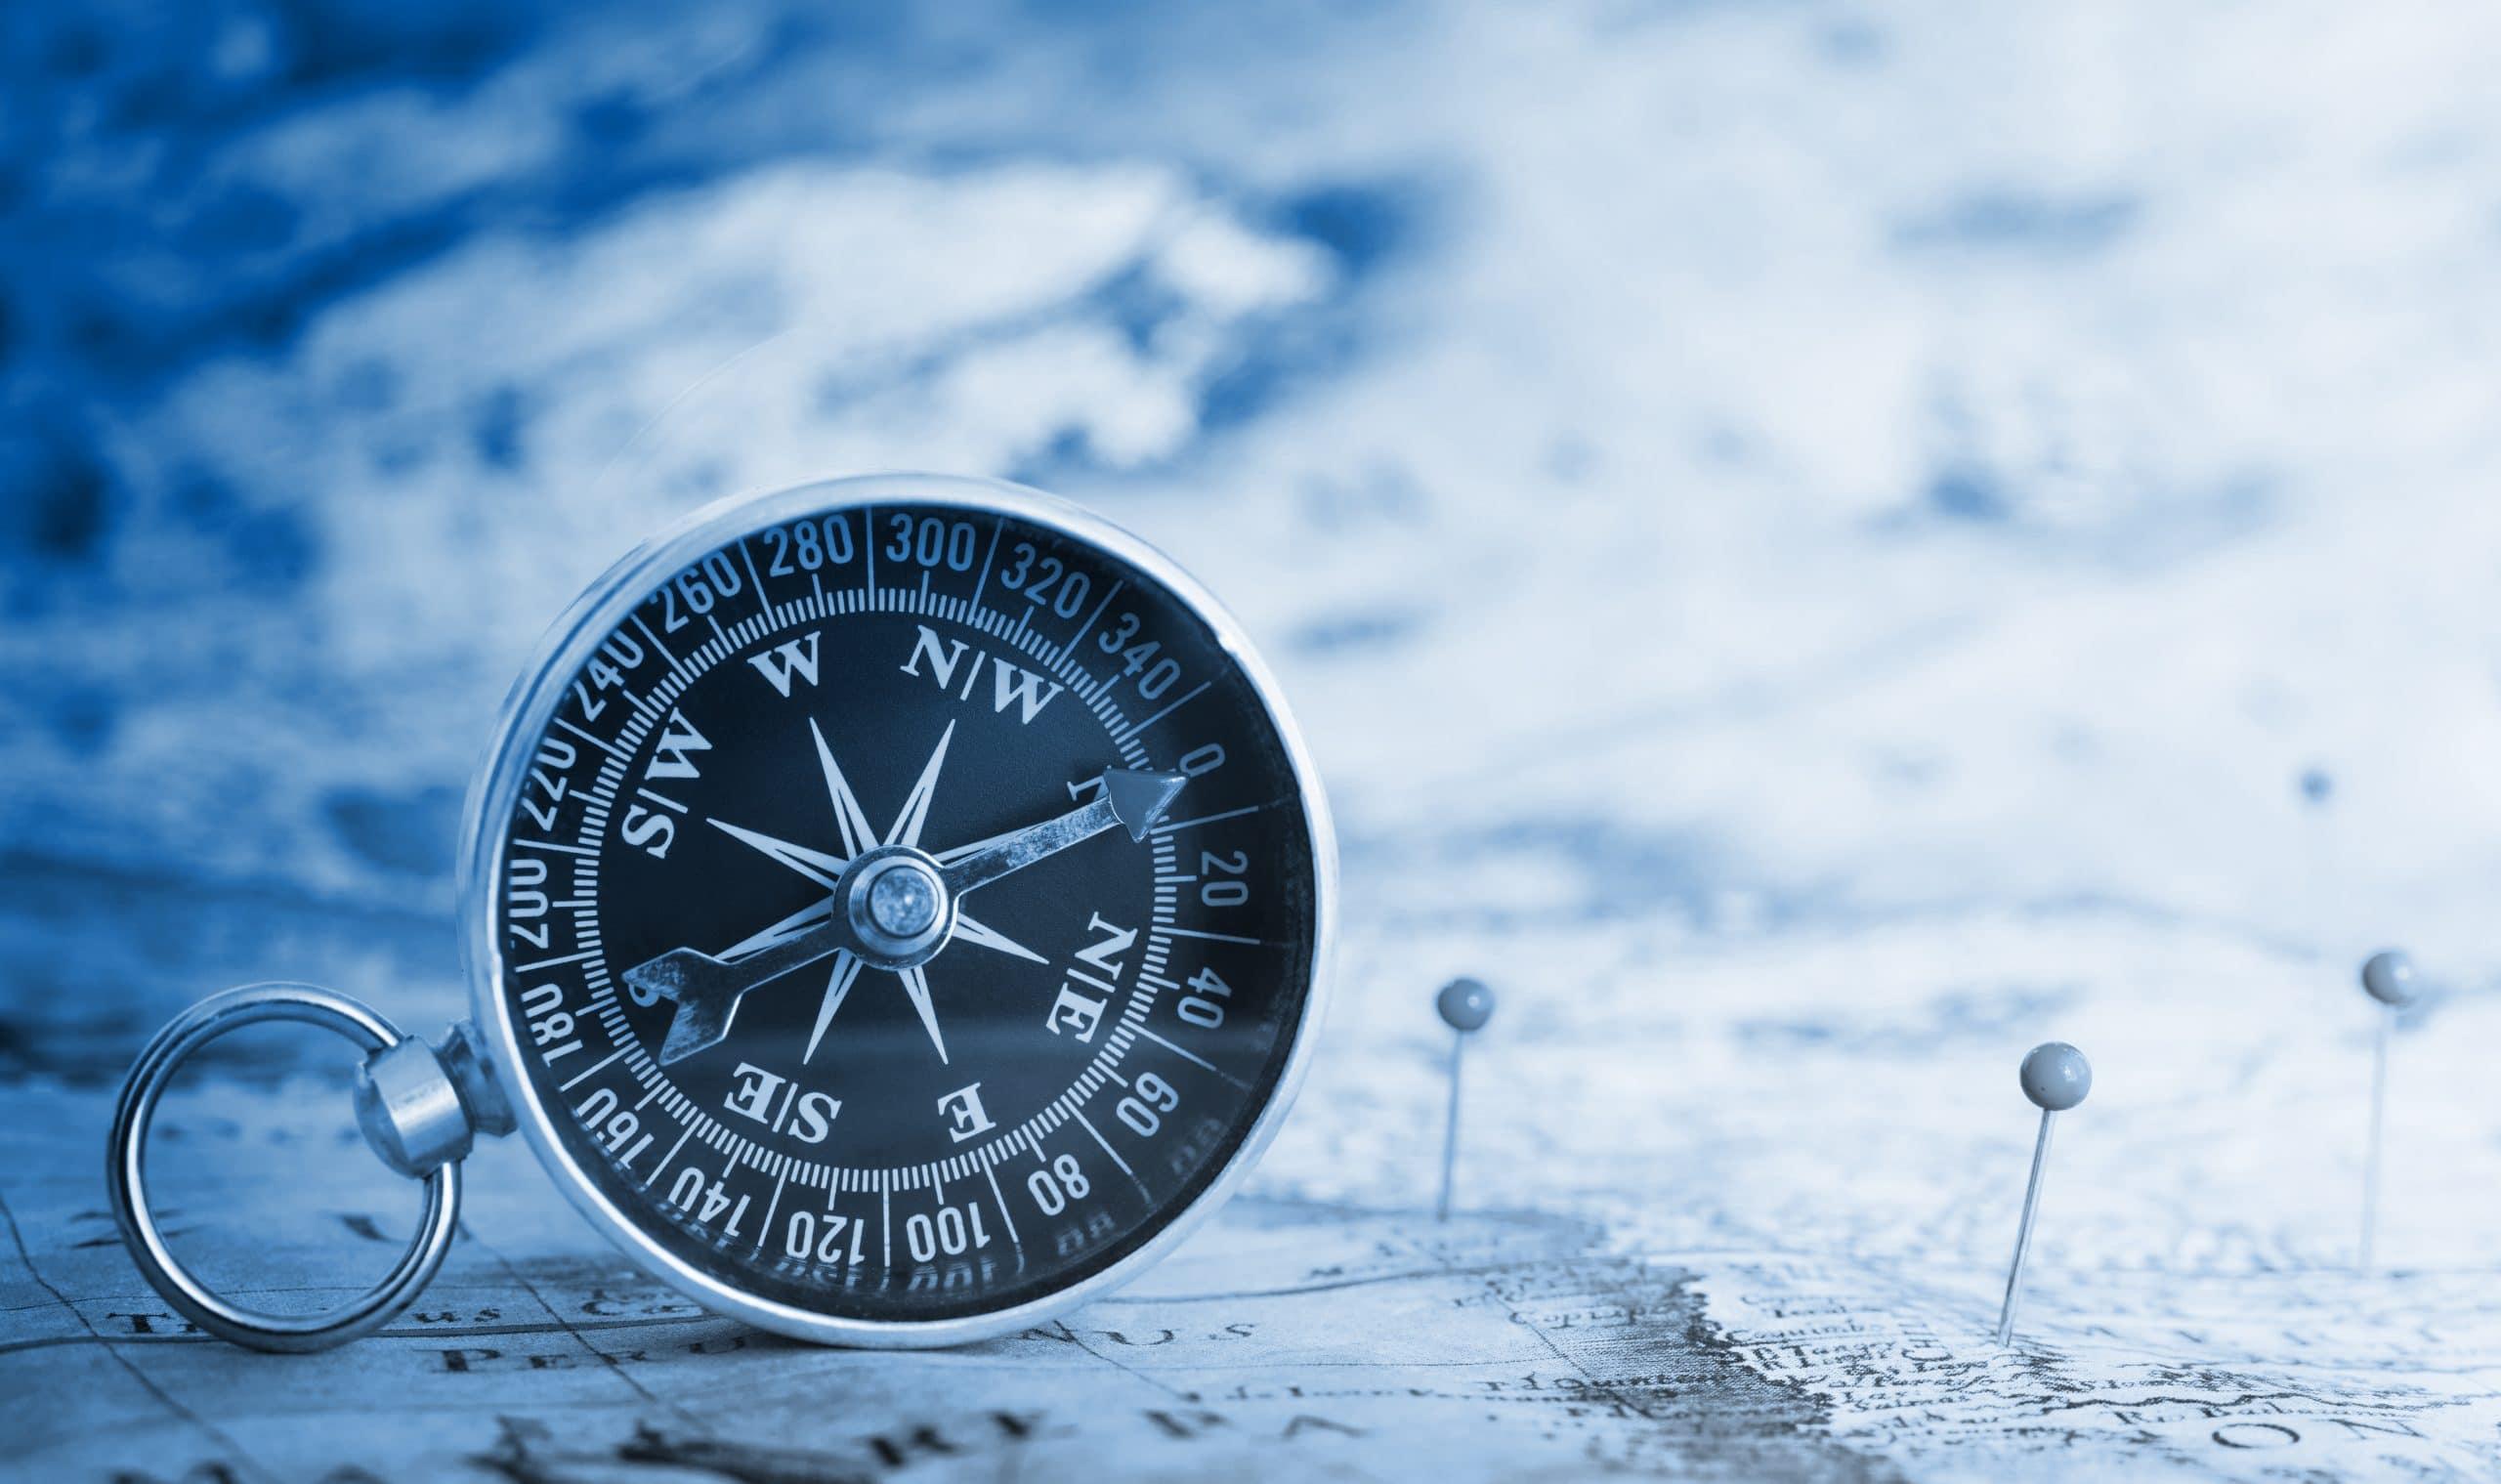 Methods Of Heading In Navigation